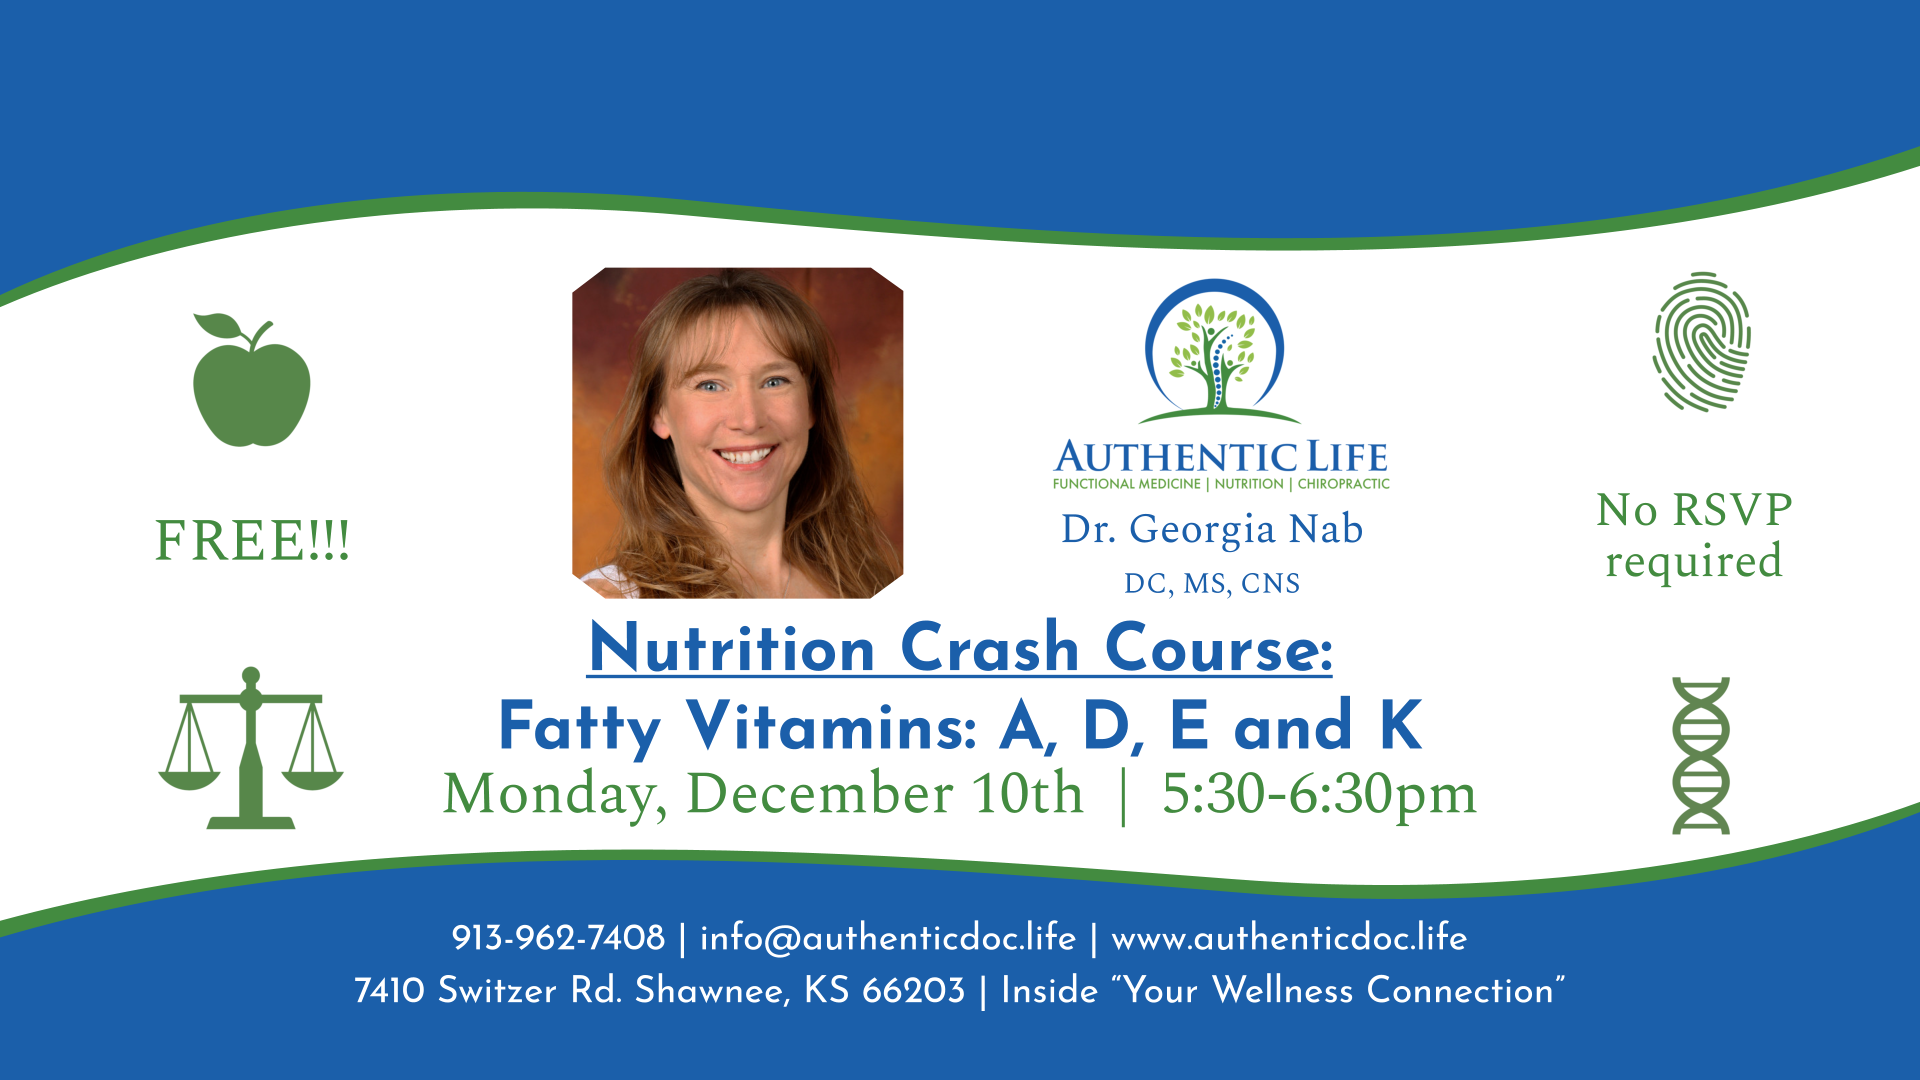 Nutrition Crash Course - Fatty Vitamins: A, D, E and K